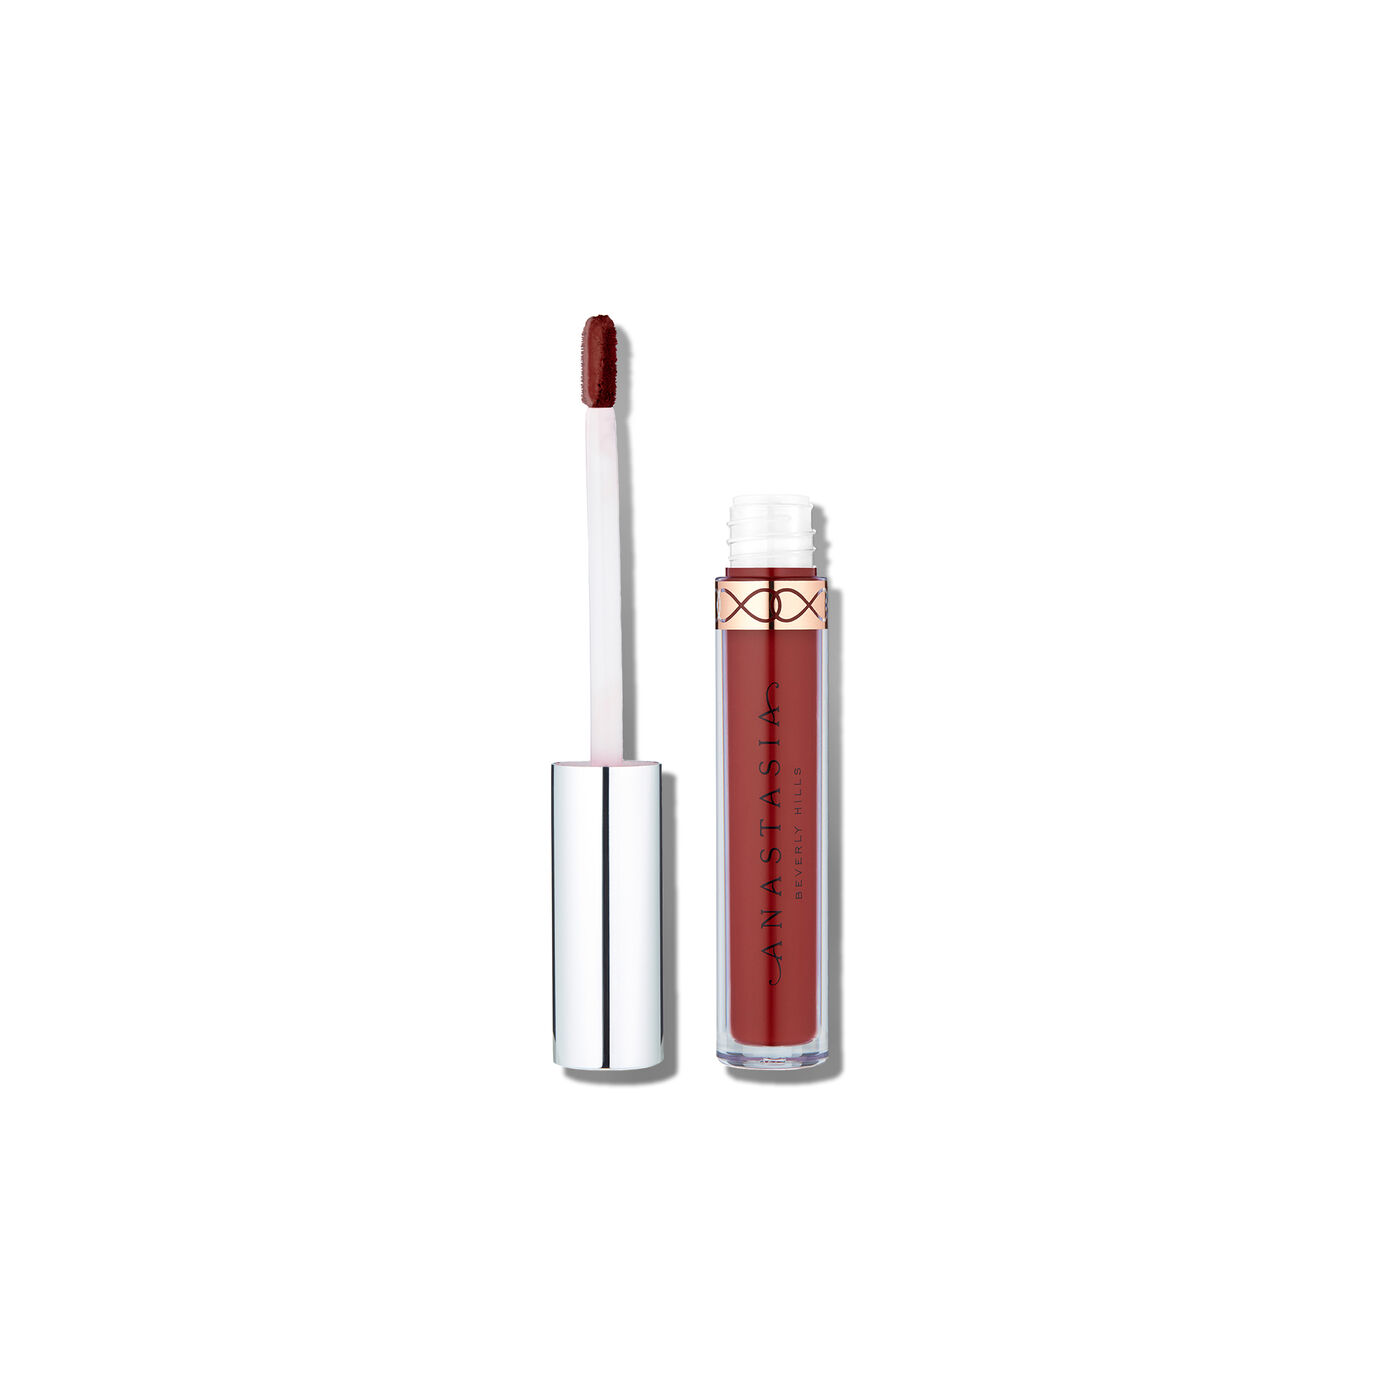 Liquid Lipstick - Currant